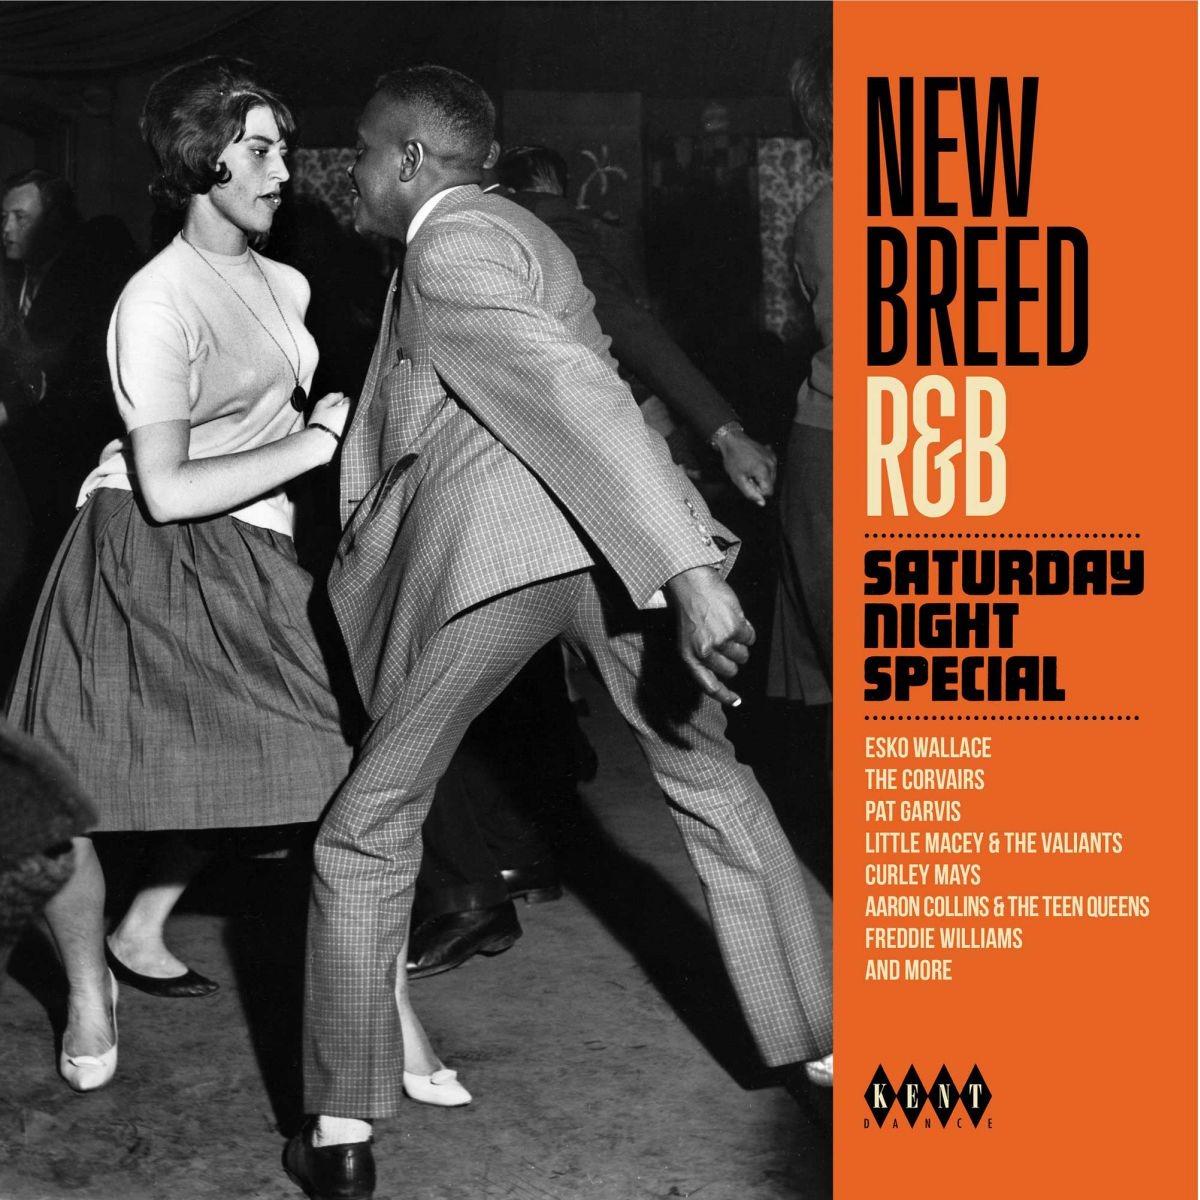 New Breed R&B - Saturday Night Special - V/A - Musik - KENT DANCE - 0029667098823 - July 31, 2020